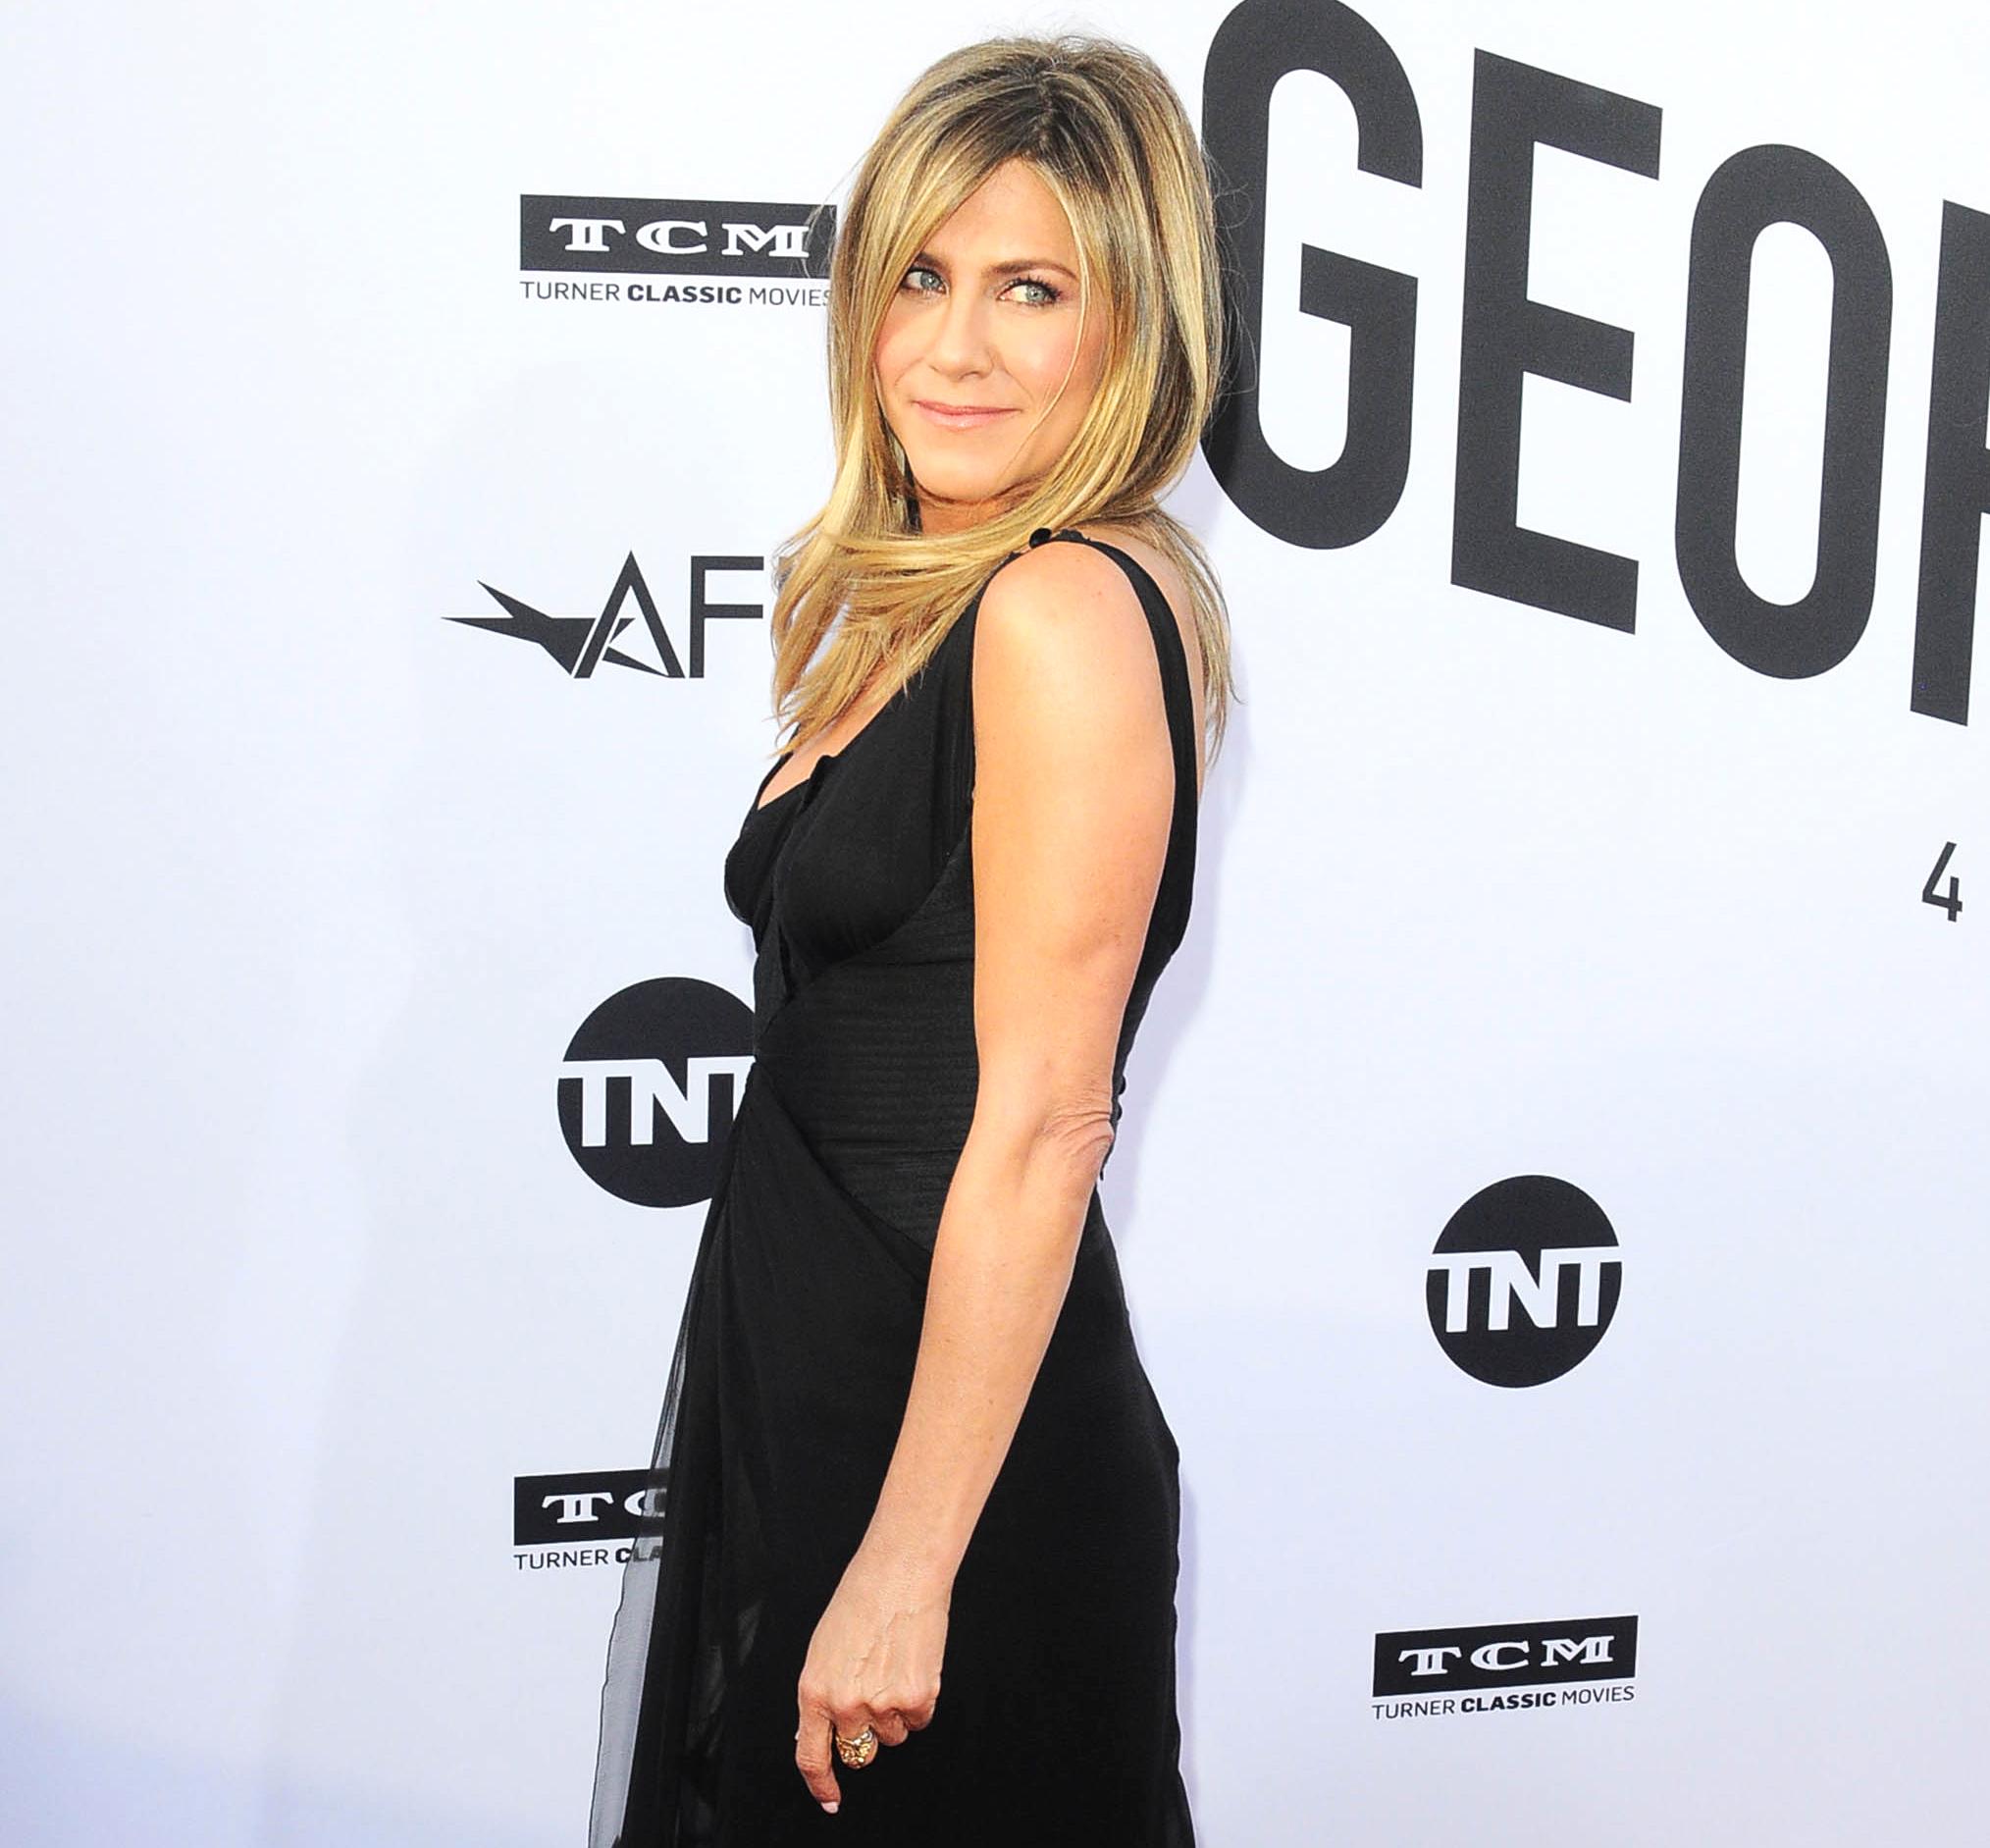 Jennifer Aniston Hasnt Given Up On Love Justin Theroux Split